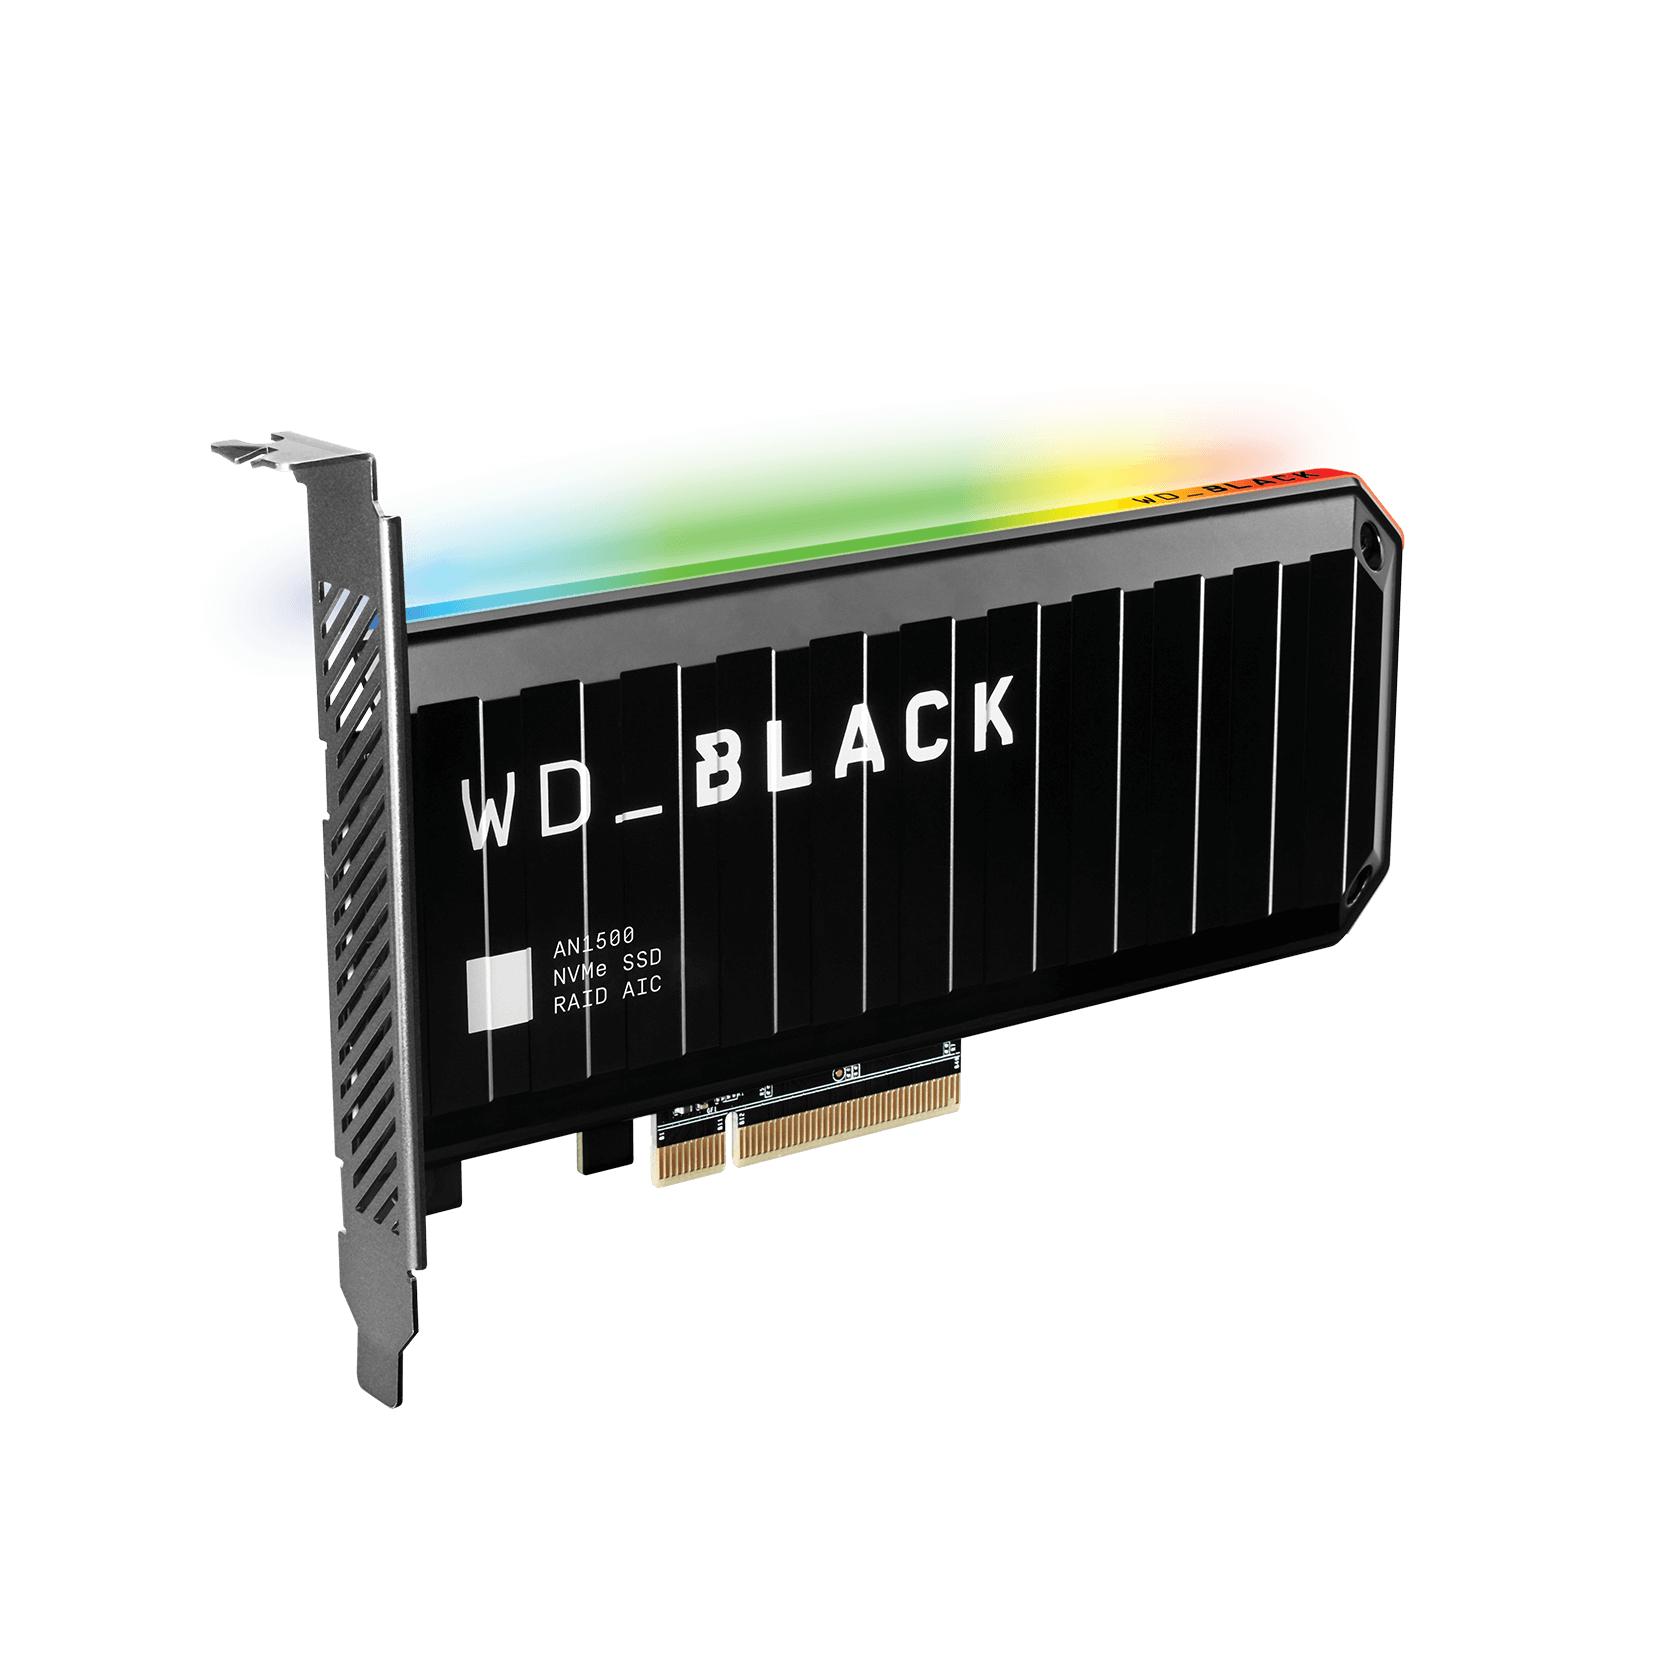 WD_BLACK AN1500 NVMe 2TB SSD Add-In-Card